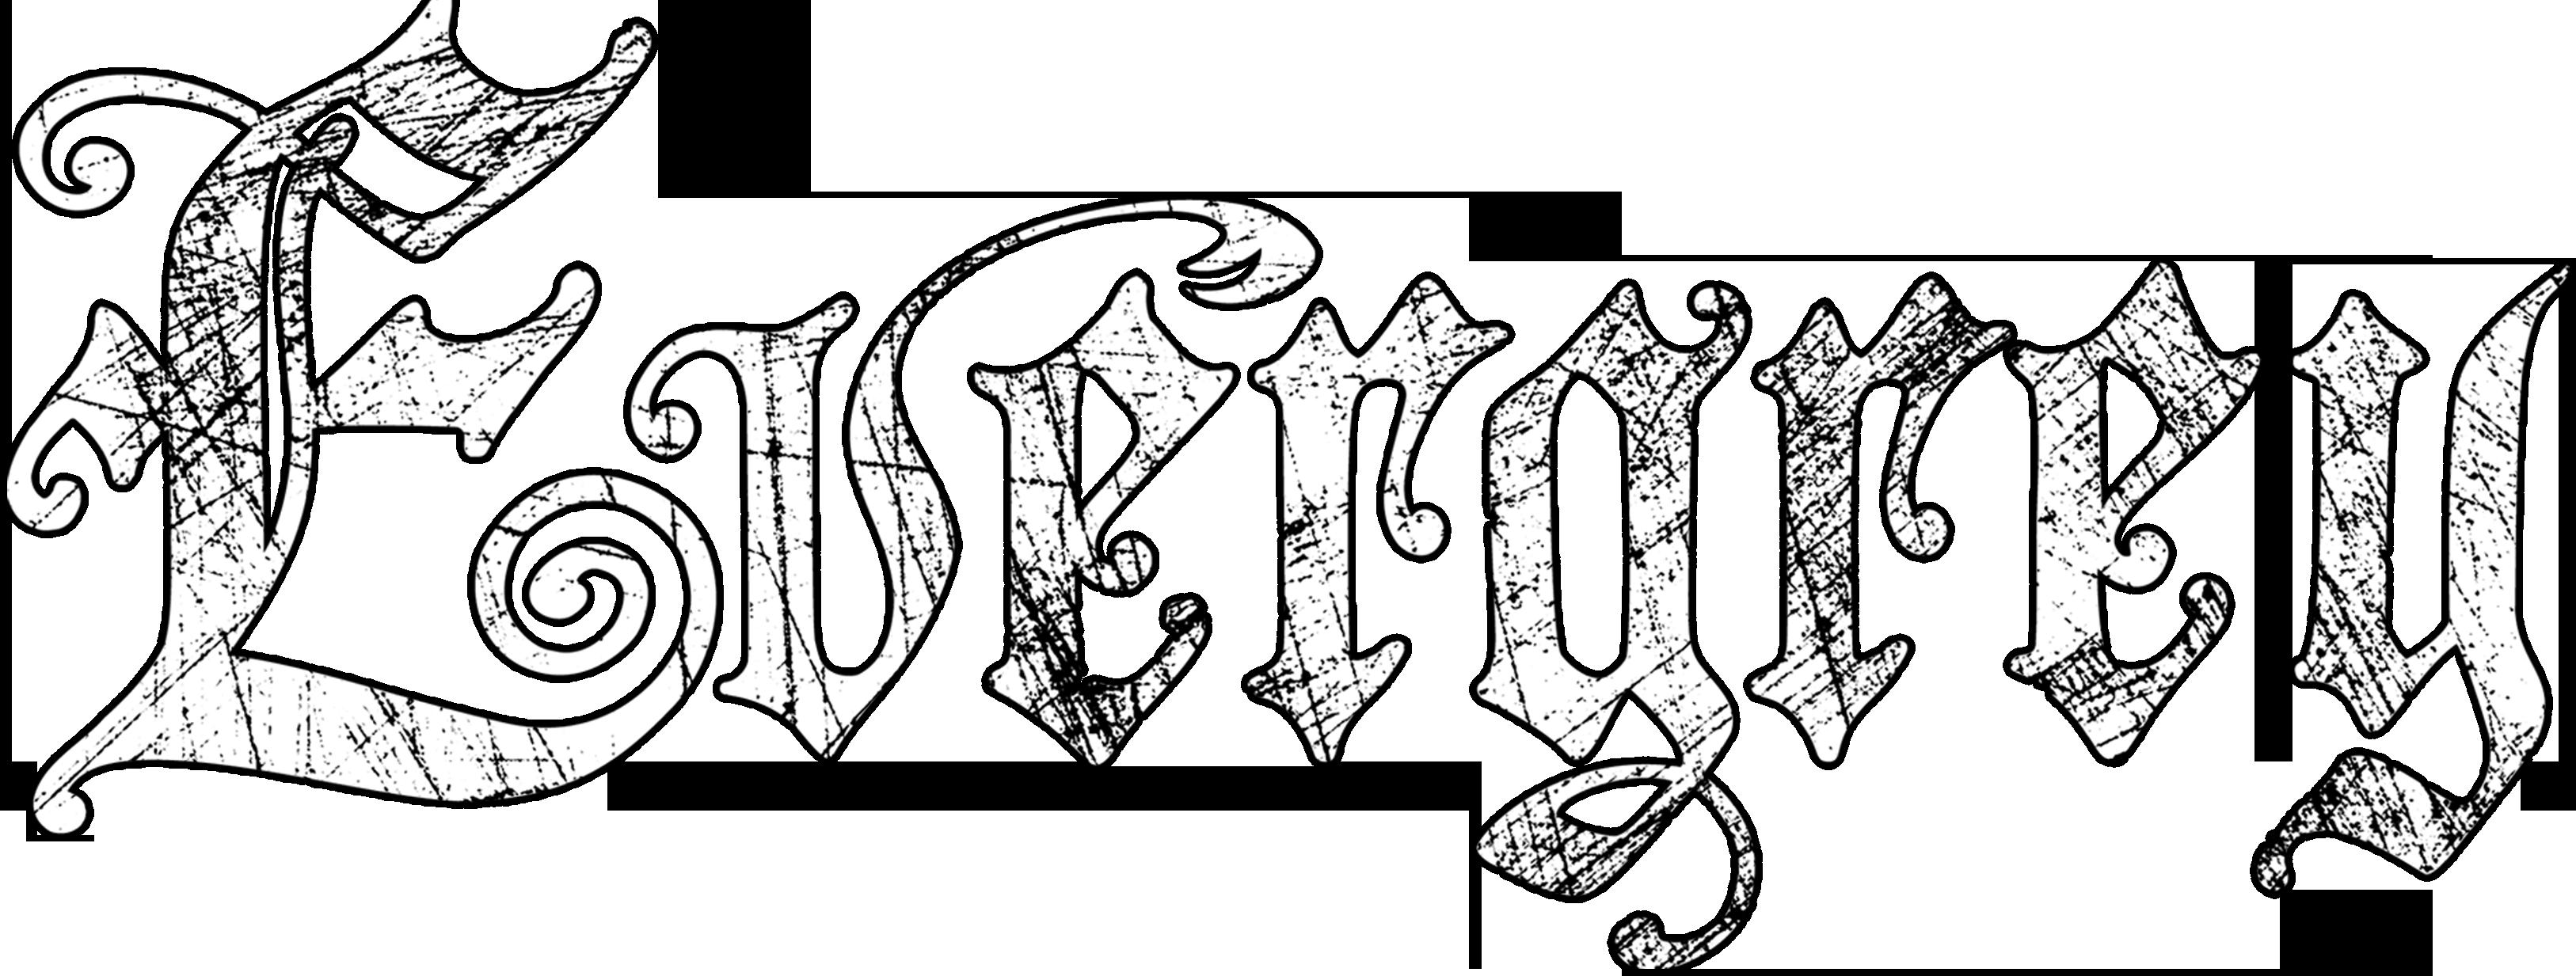 Evergrey Hd Desktop